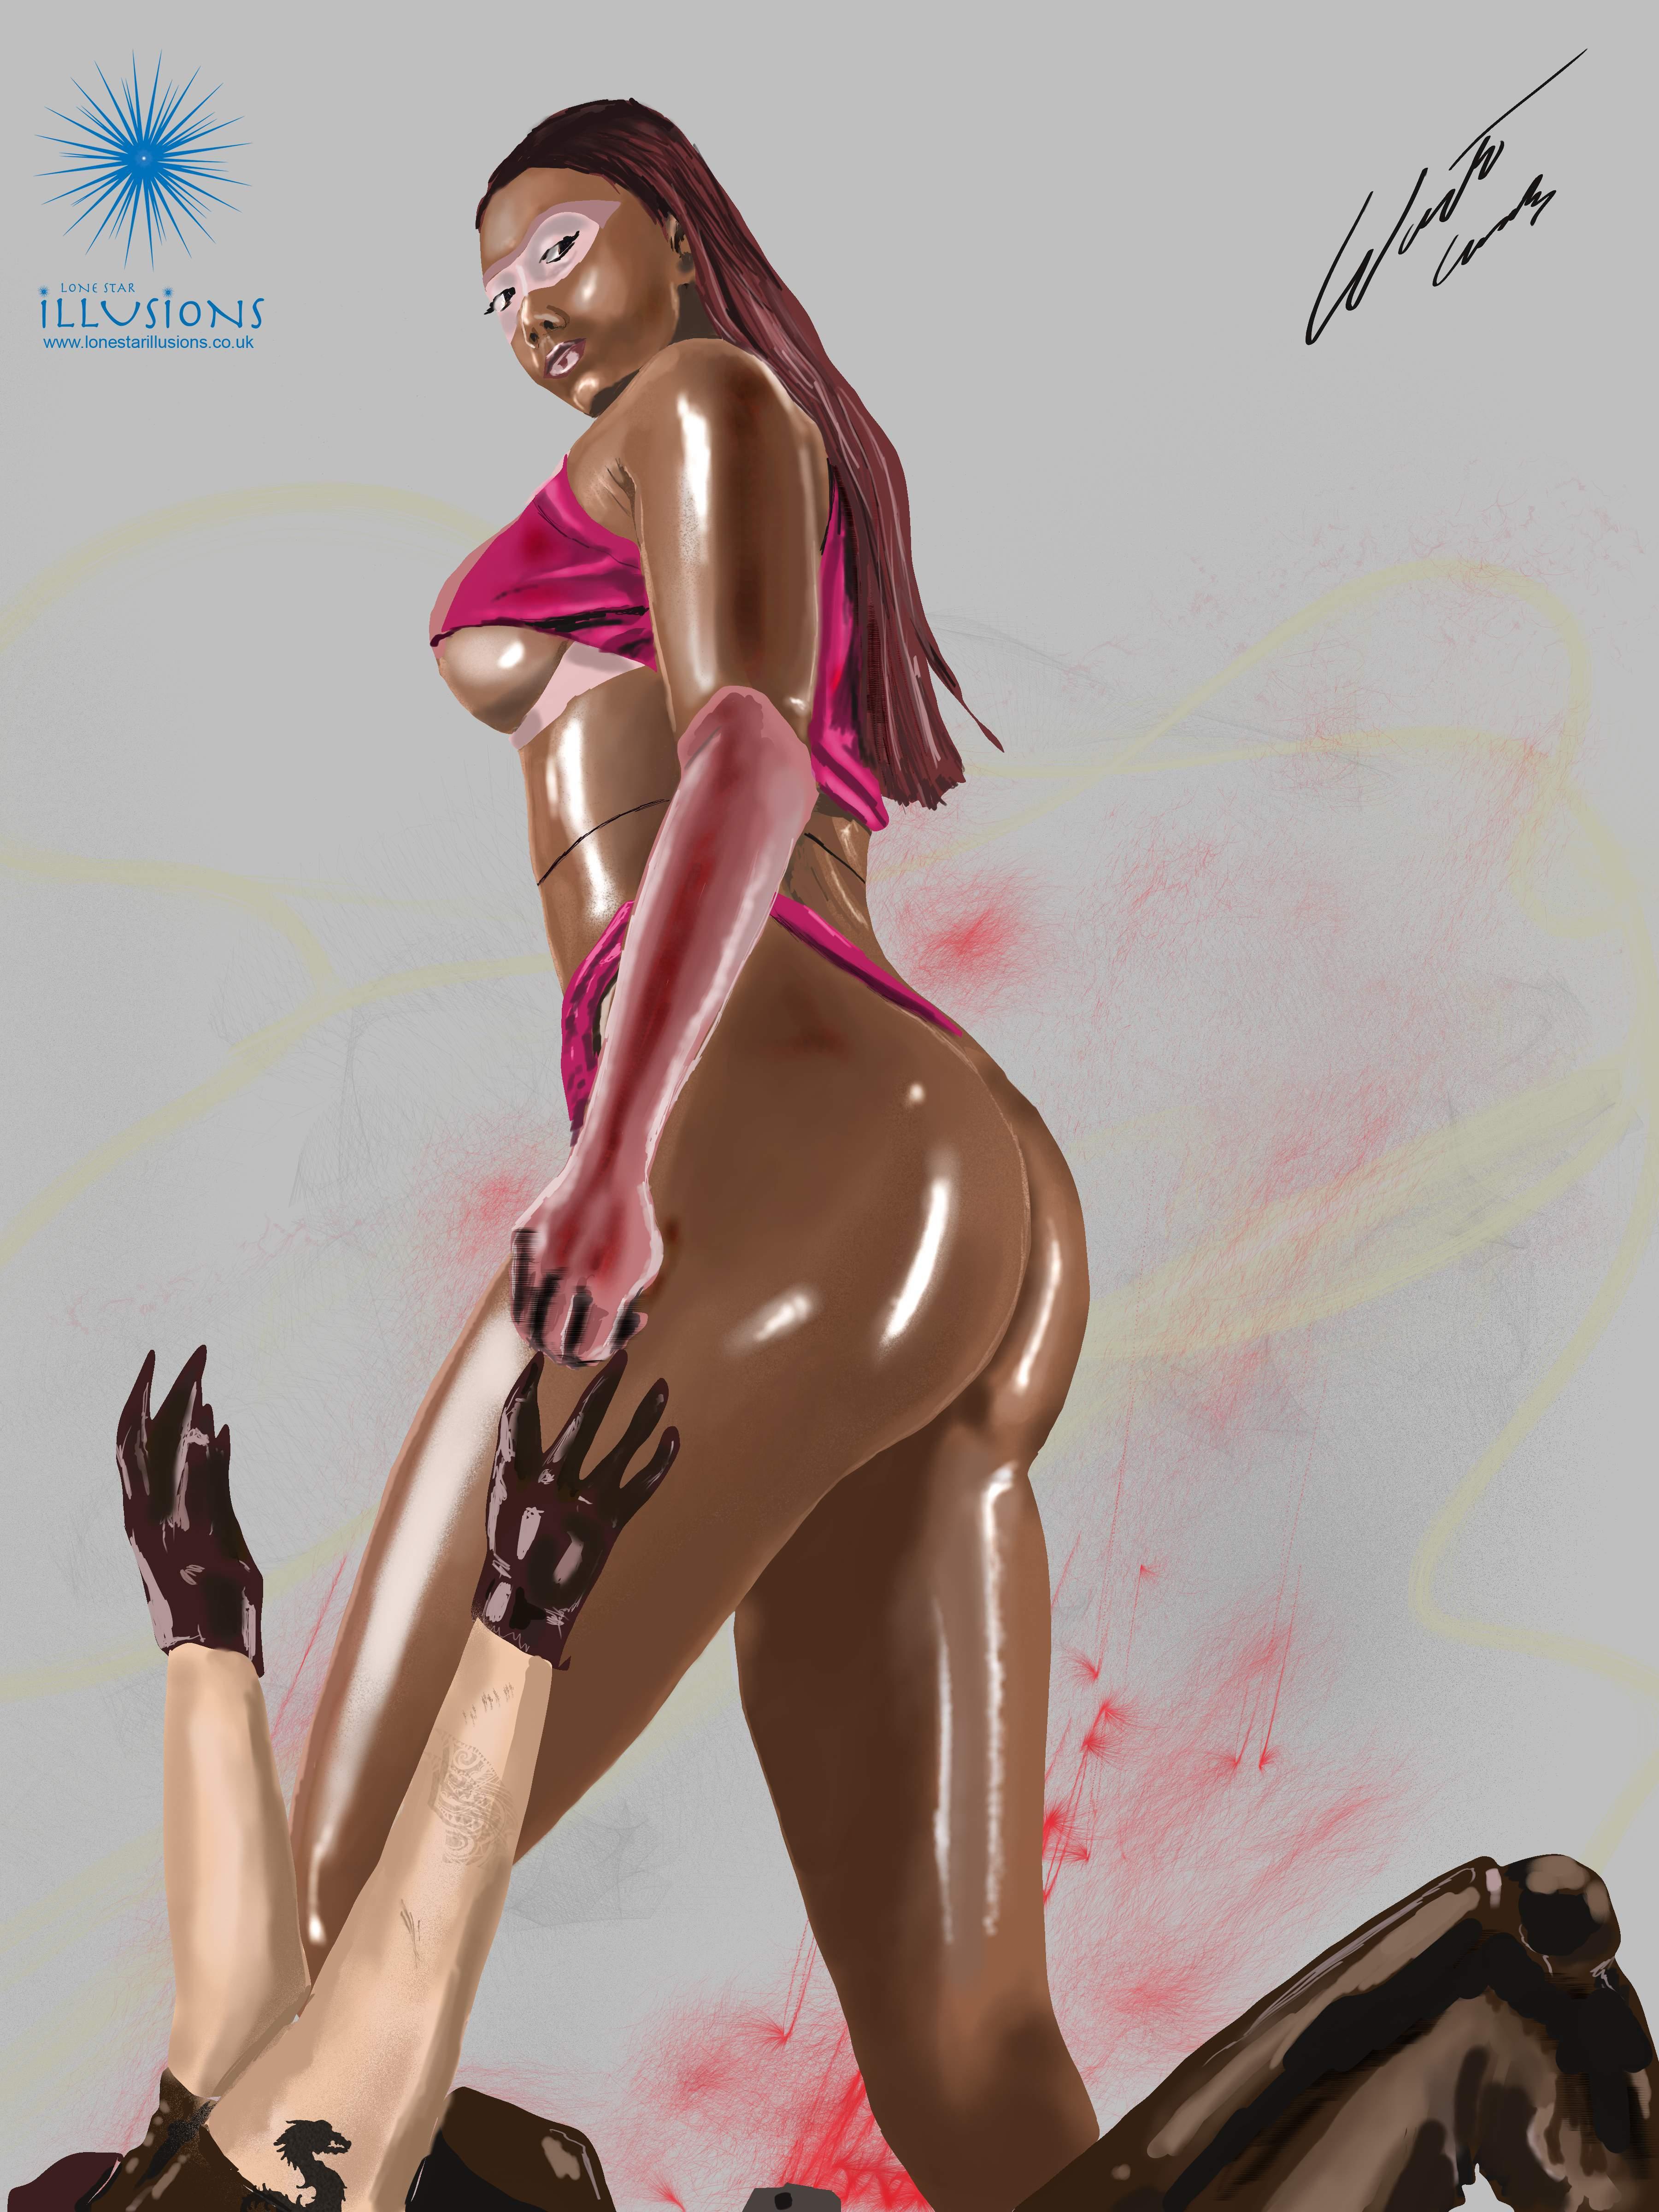 Sexy female, erotic illustration,